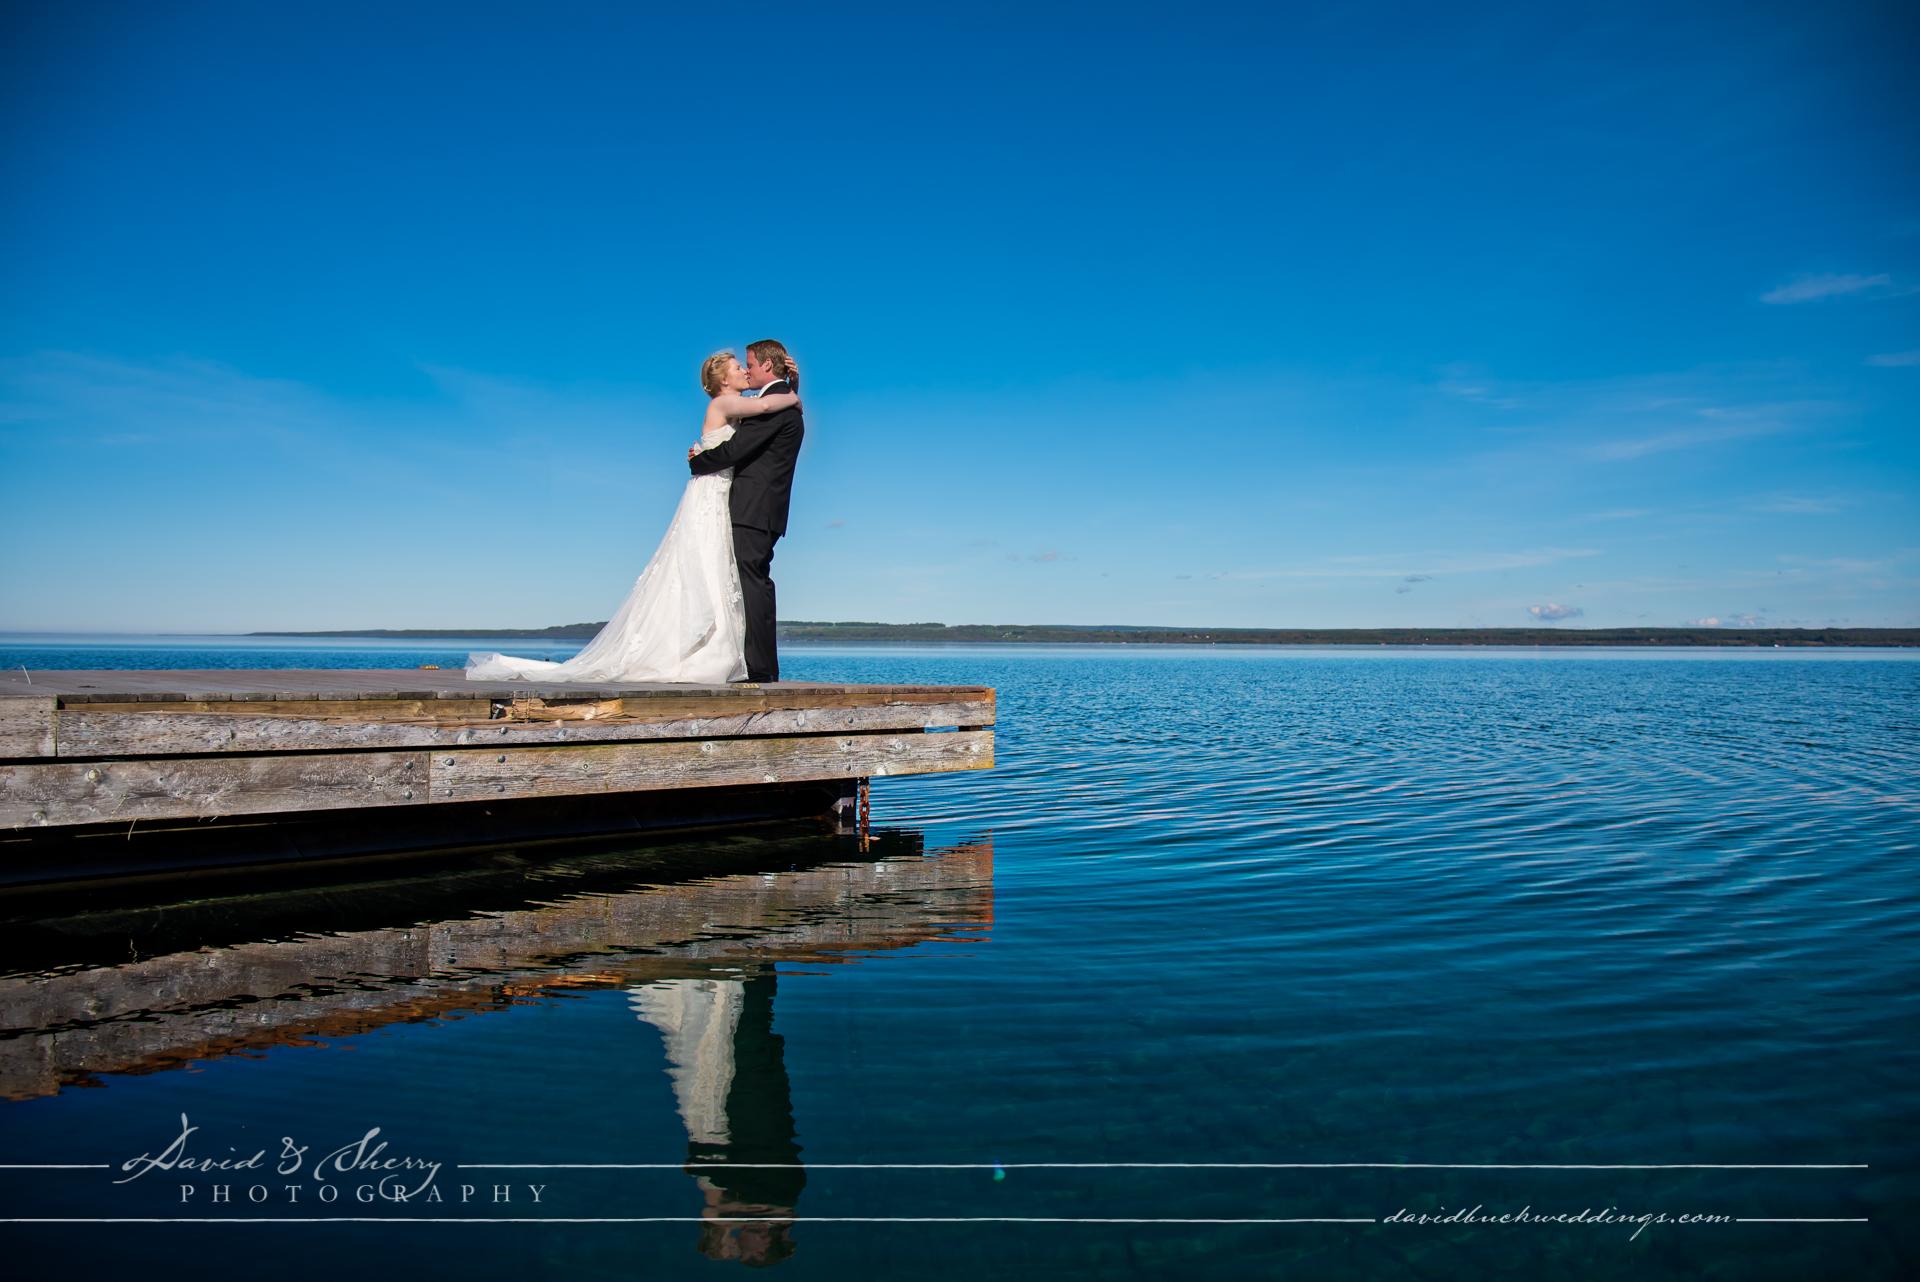 Cobble_Beach_Wedding_Photography_19